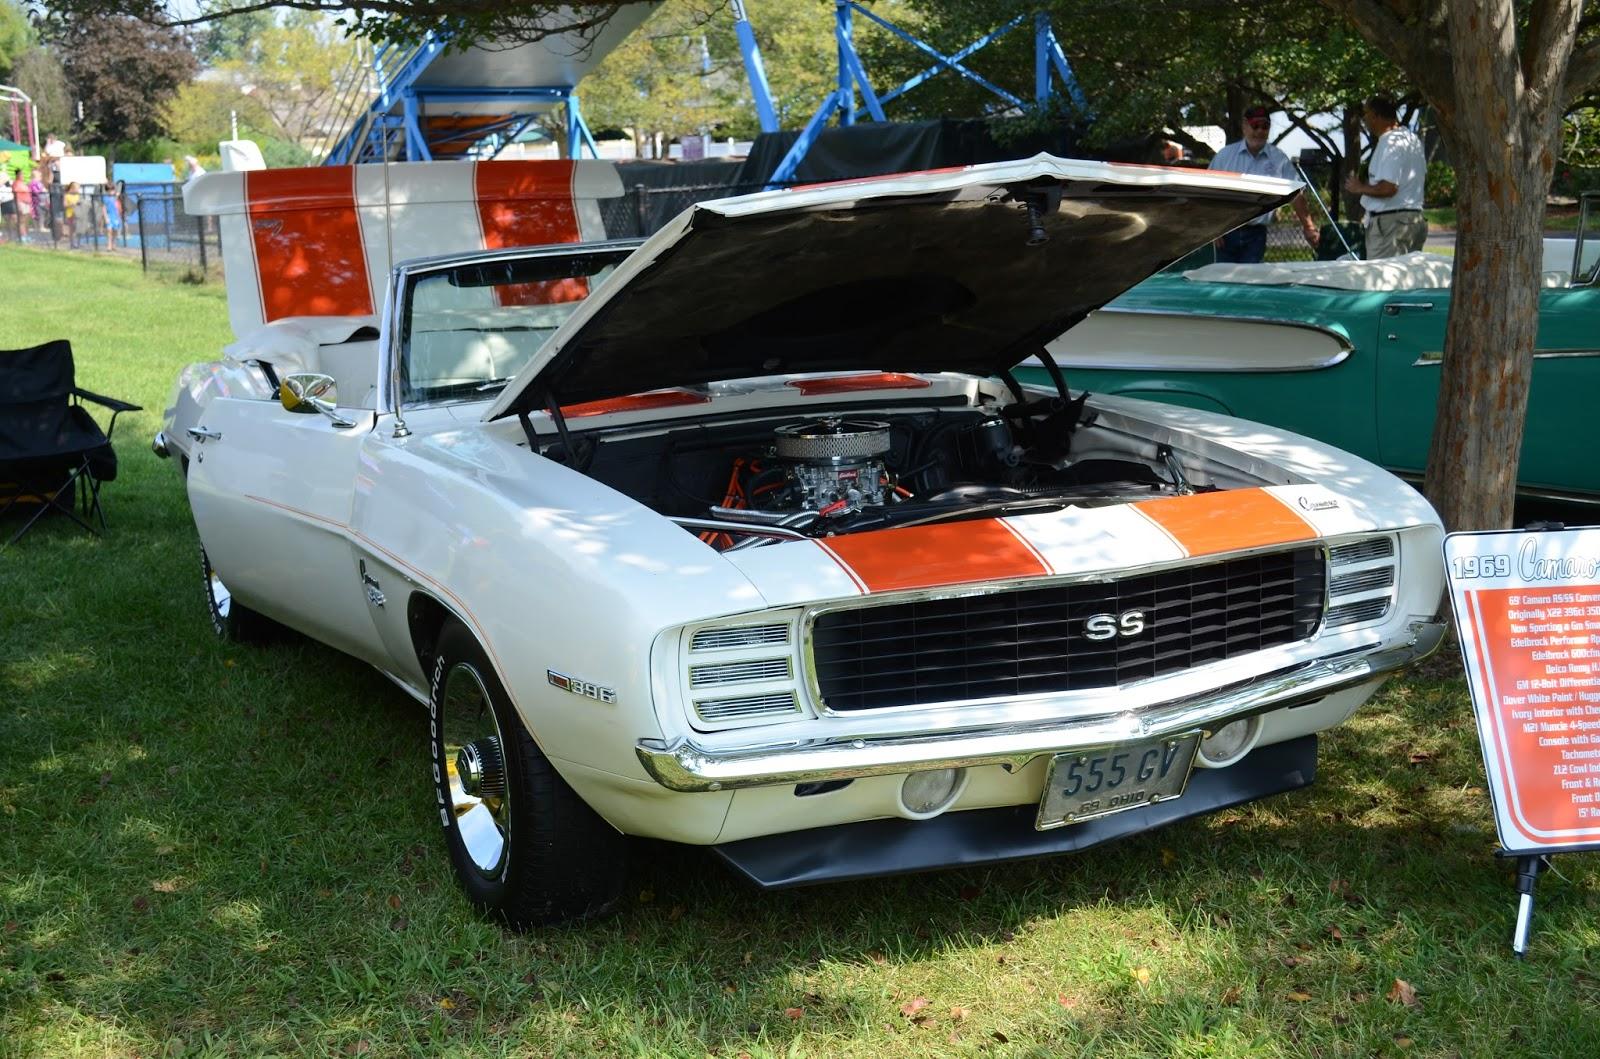 Turnerbudds Car Blog: The End of Summer Show